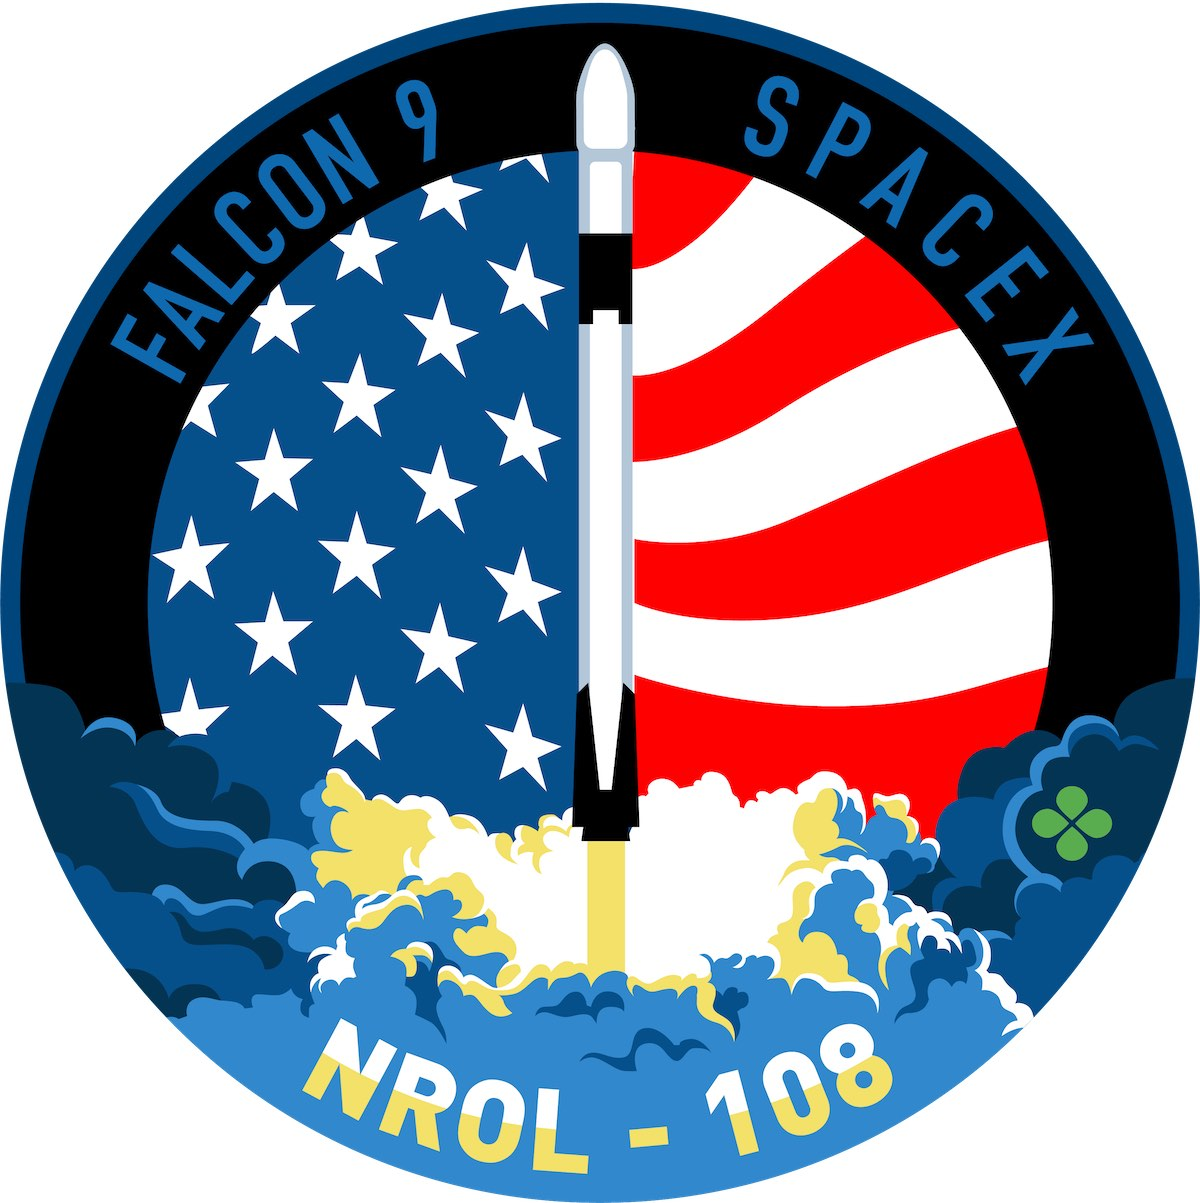 NROL 108 final SpaceX Boca Chica